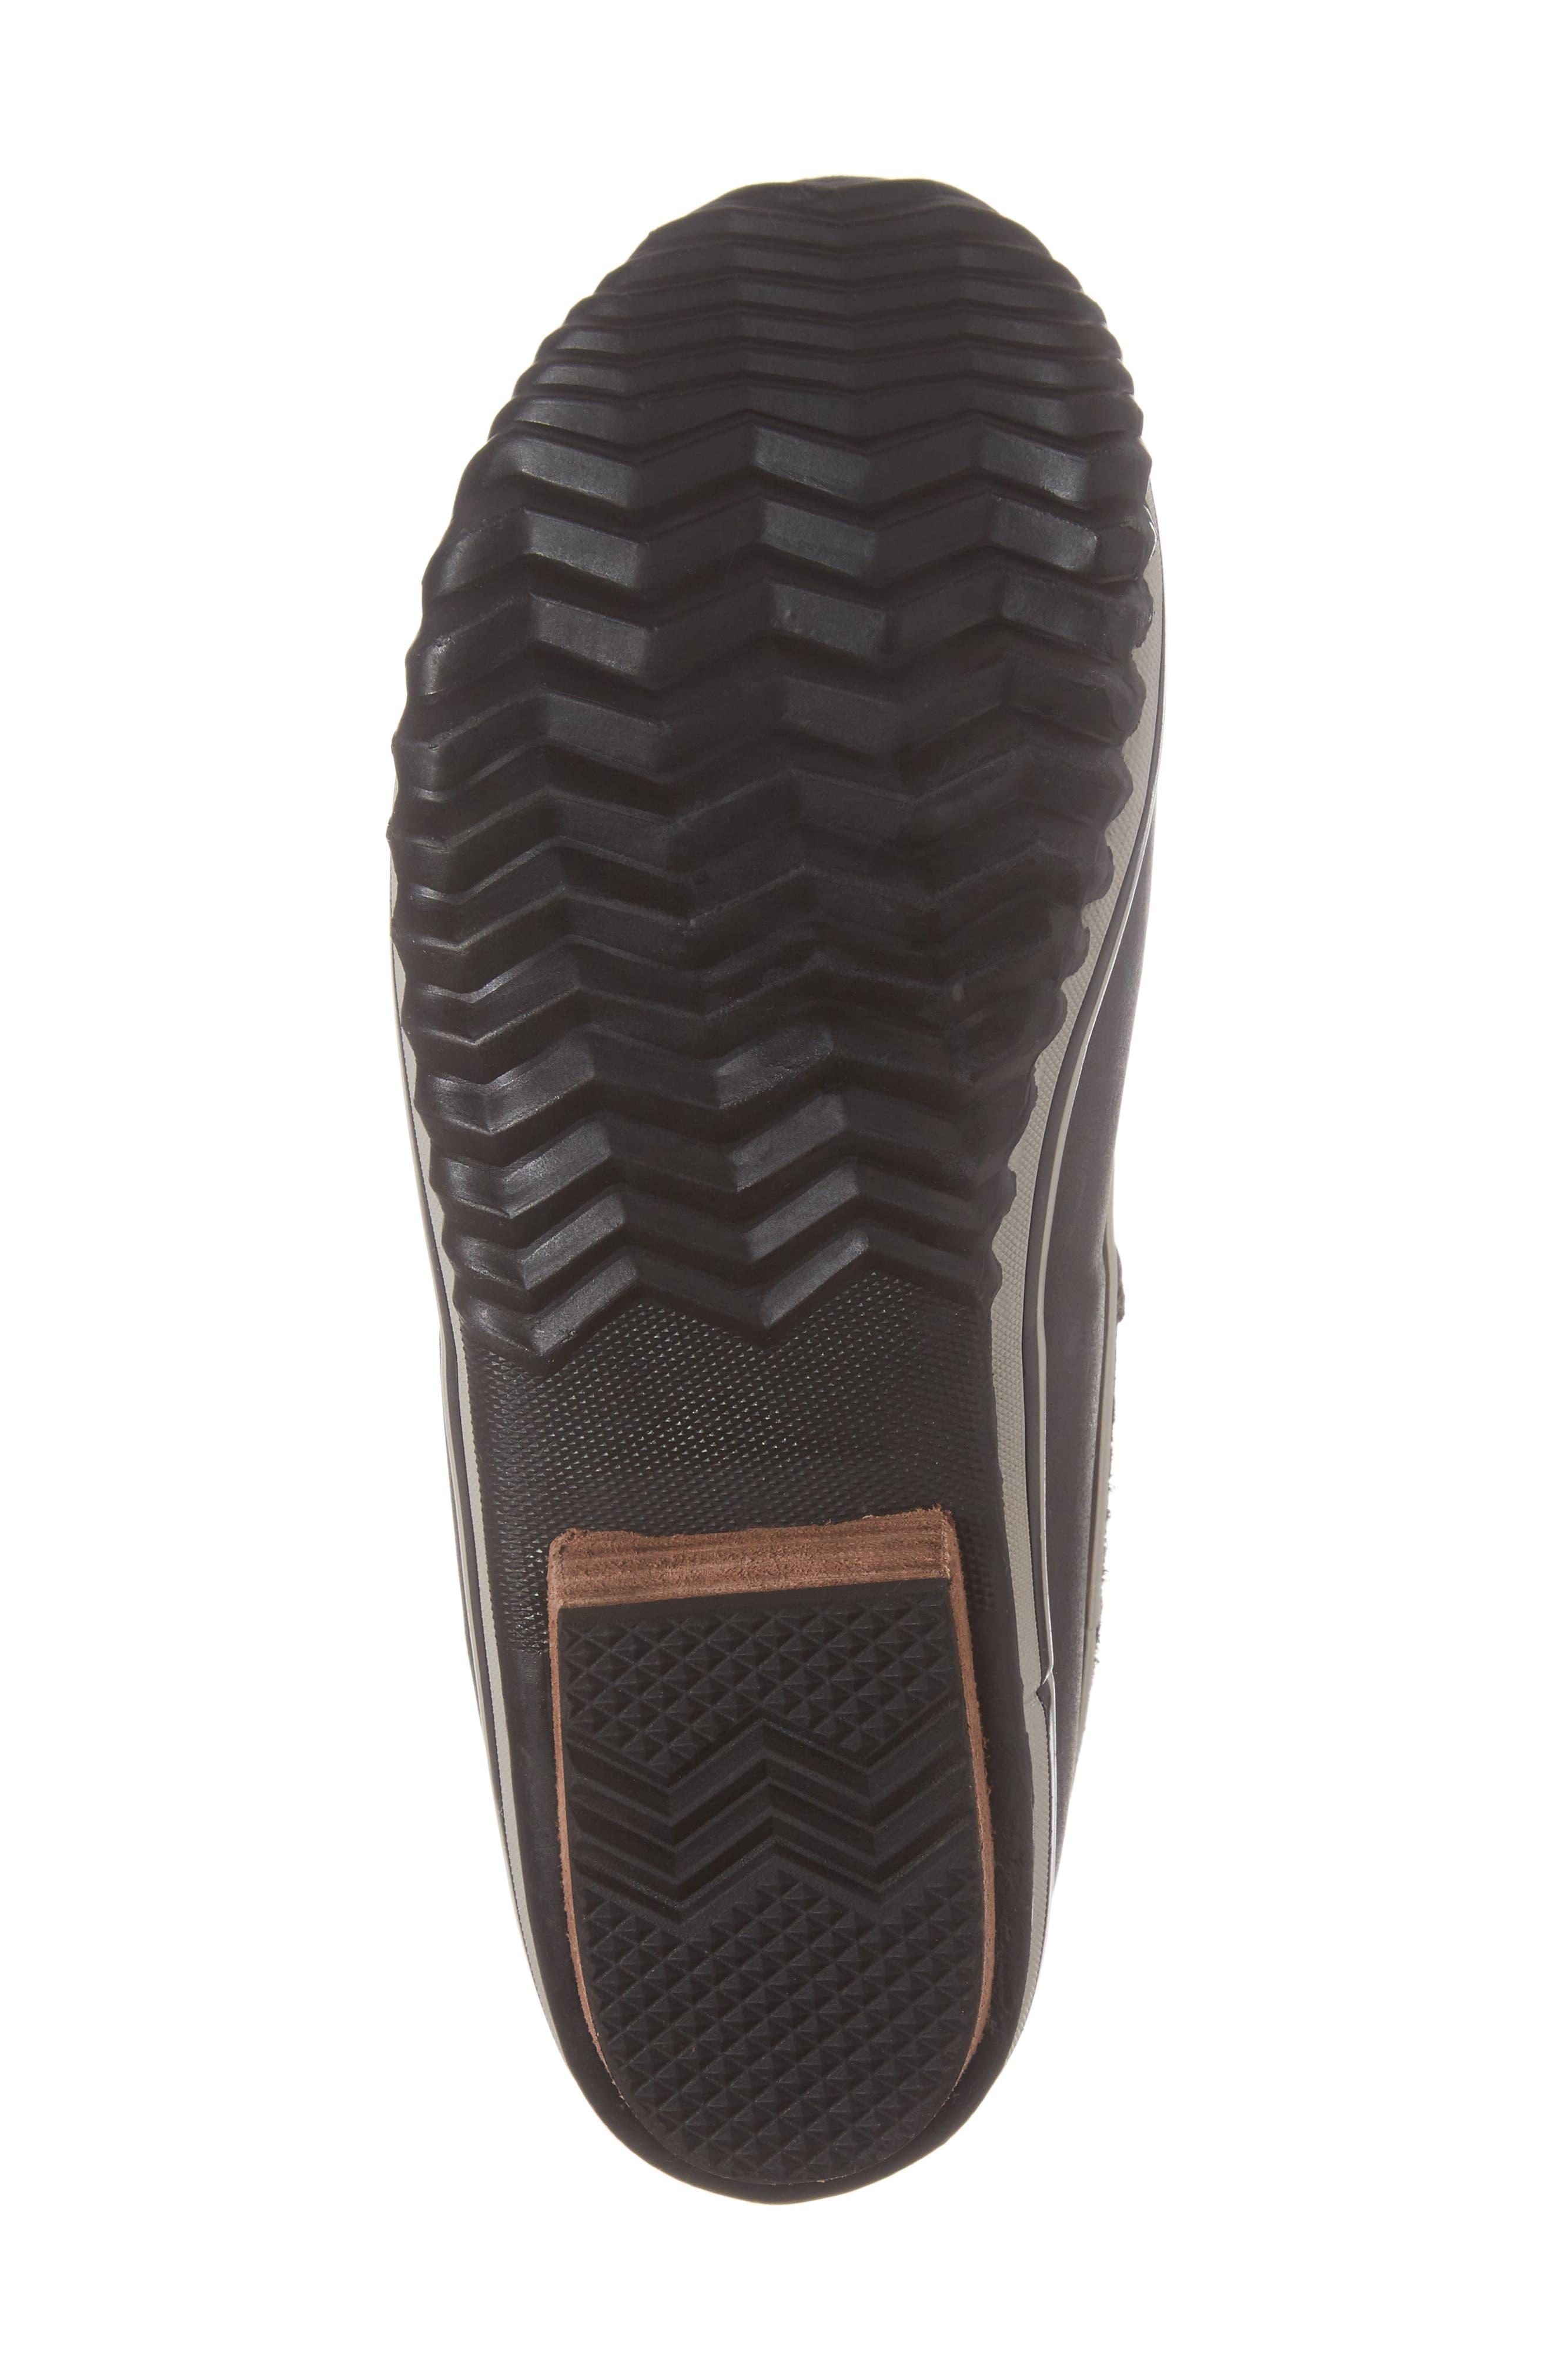 Slimpack II Waterproof Boot,                             Alternate thumbnail 6, color,                             Quarry/ Black